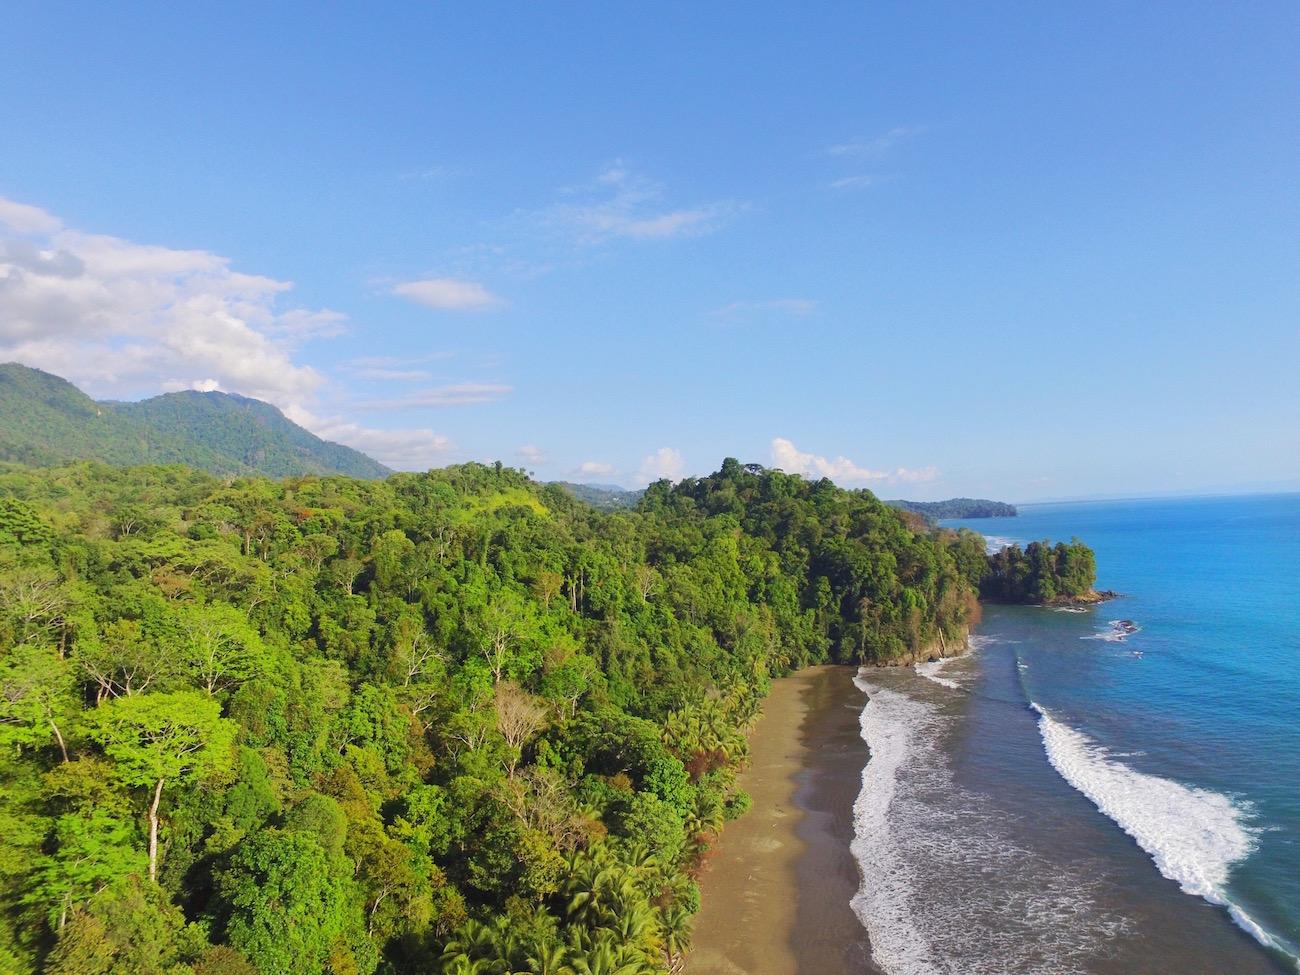 Jungle and Ocean view in Uvita Costa Rica